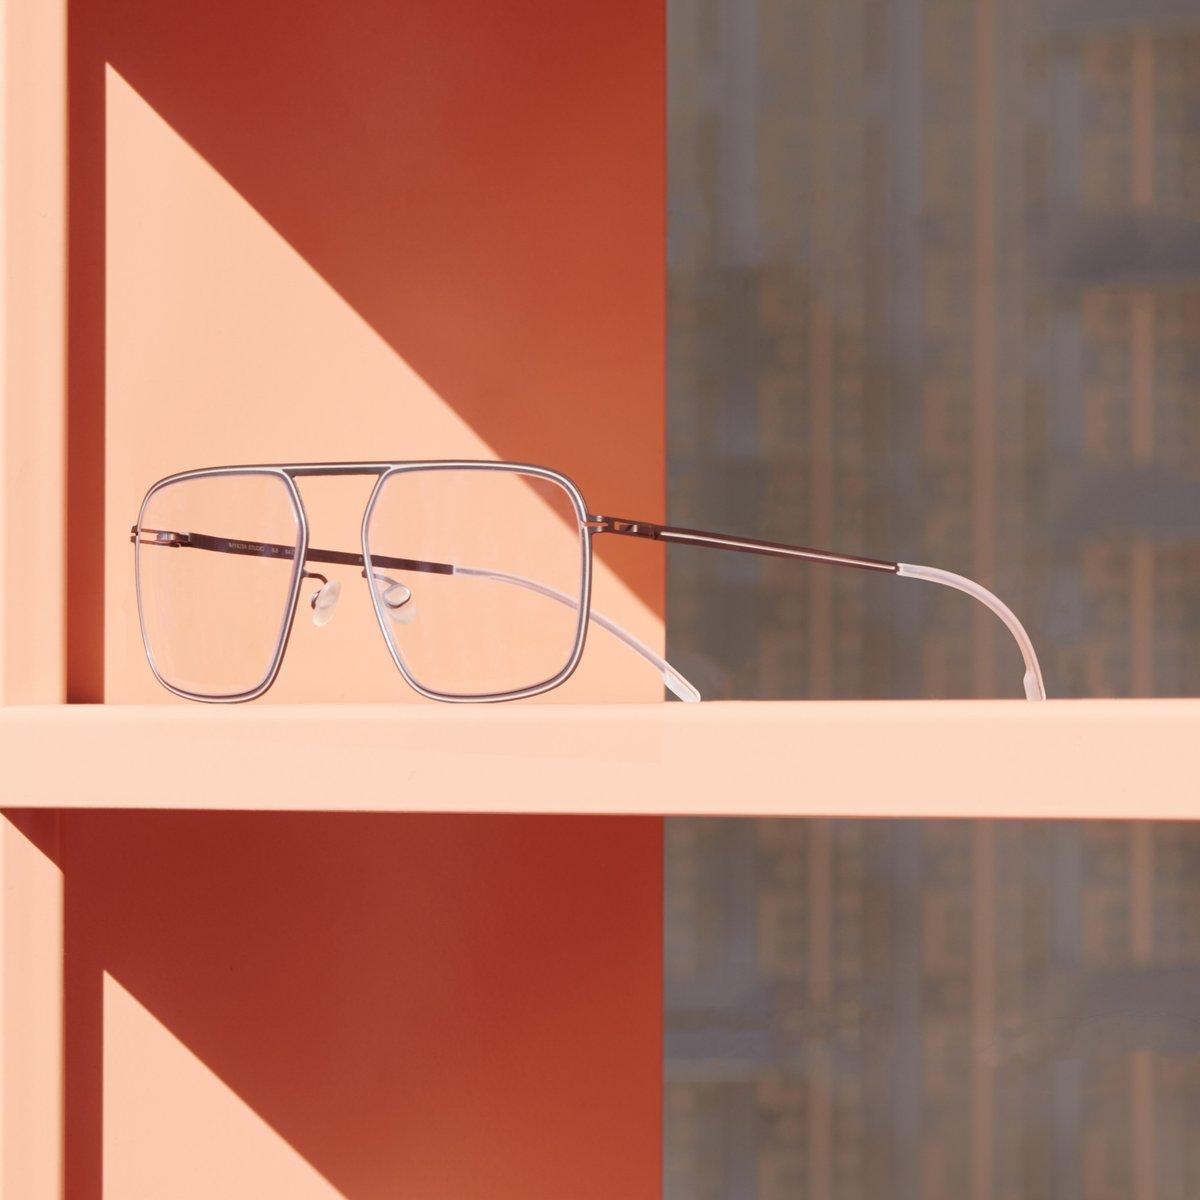 STUDIO 6.8 | MYKITA STUDIO Radical simplicity – optical model STUDIO 6.8 is classic navigator silhouette with a distinctive keyhole bridge. https://t.co/4H0rncicEN #MYKITA #mykitastudio https://t.co/u8d1ar8NY5